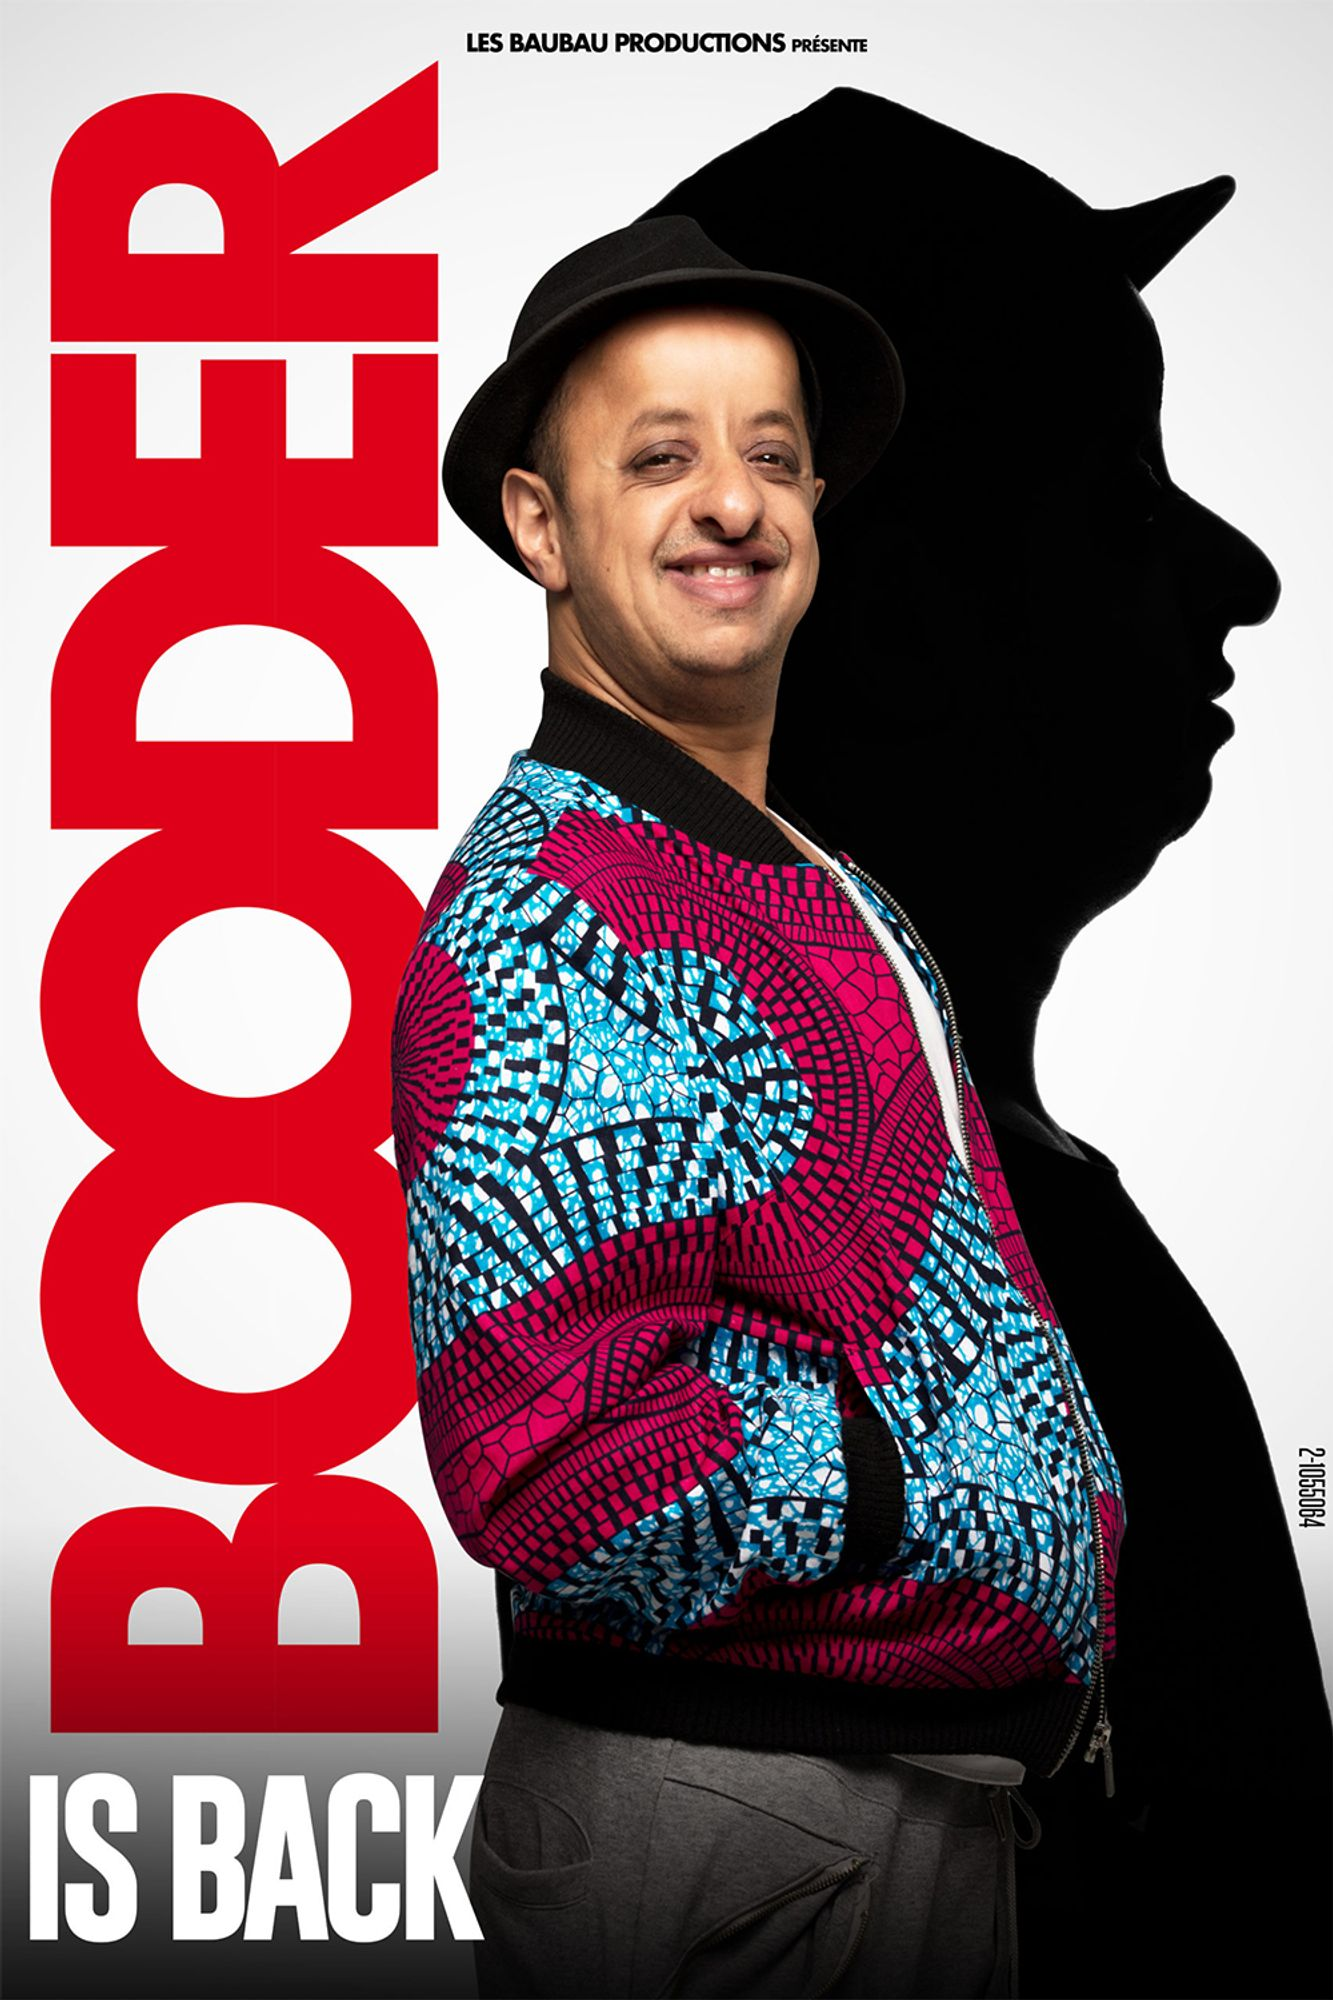 Booder08-03-2021_AGENDA